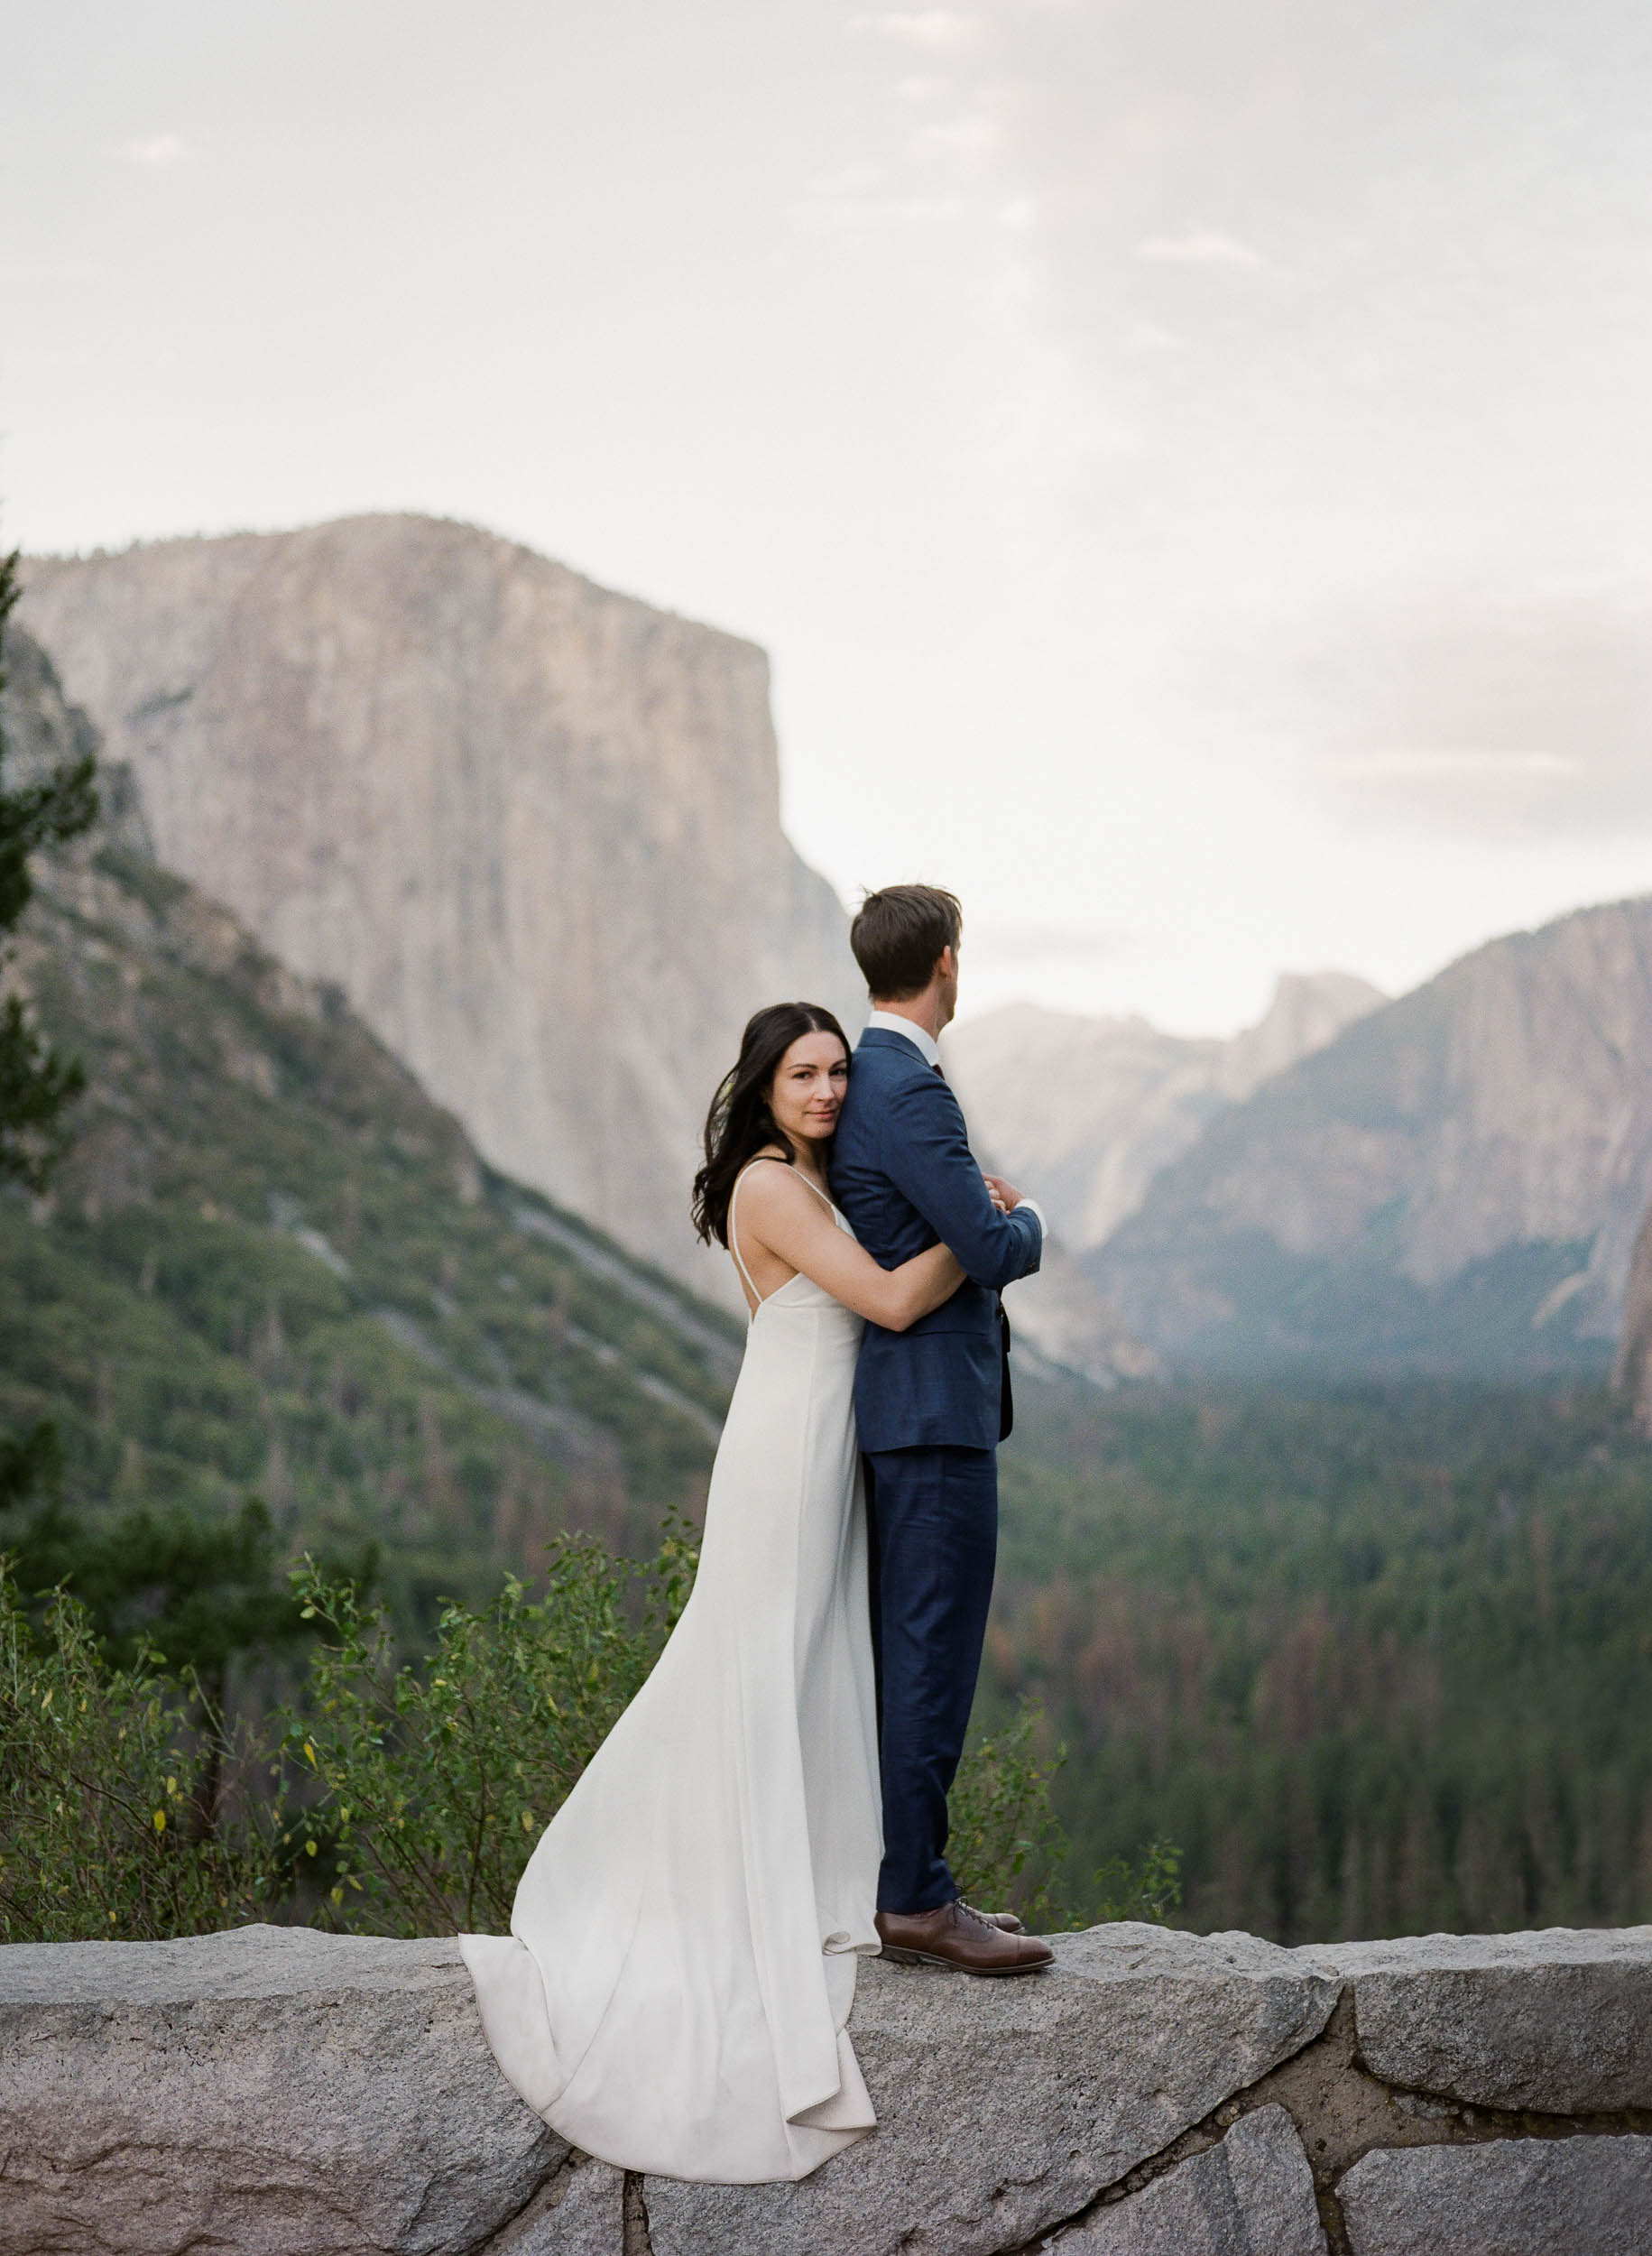 Intimate Yosemite Wedding_Buena Lane Photography_000063840014.jpg